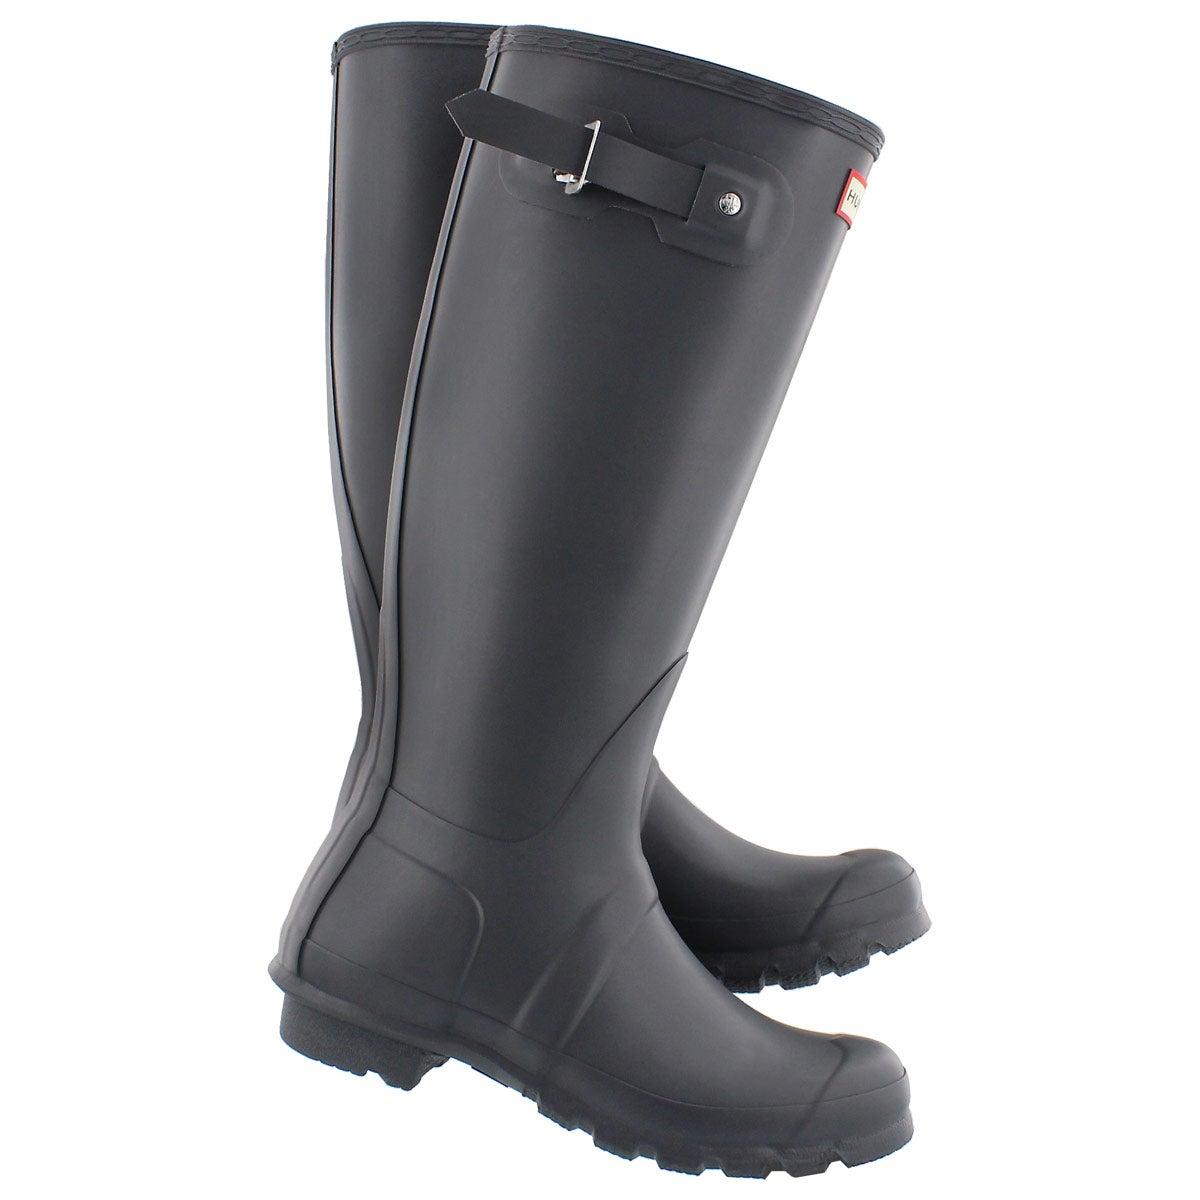 Lds Original Tall Classic grey rain boot